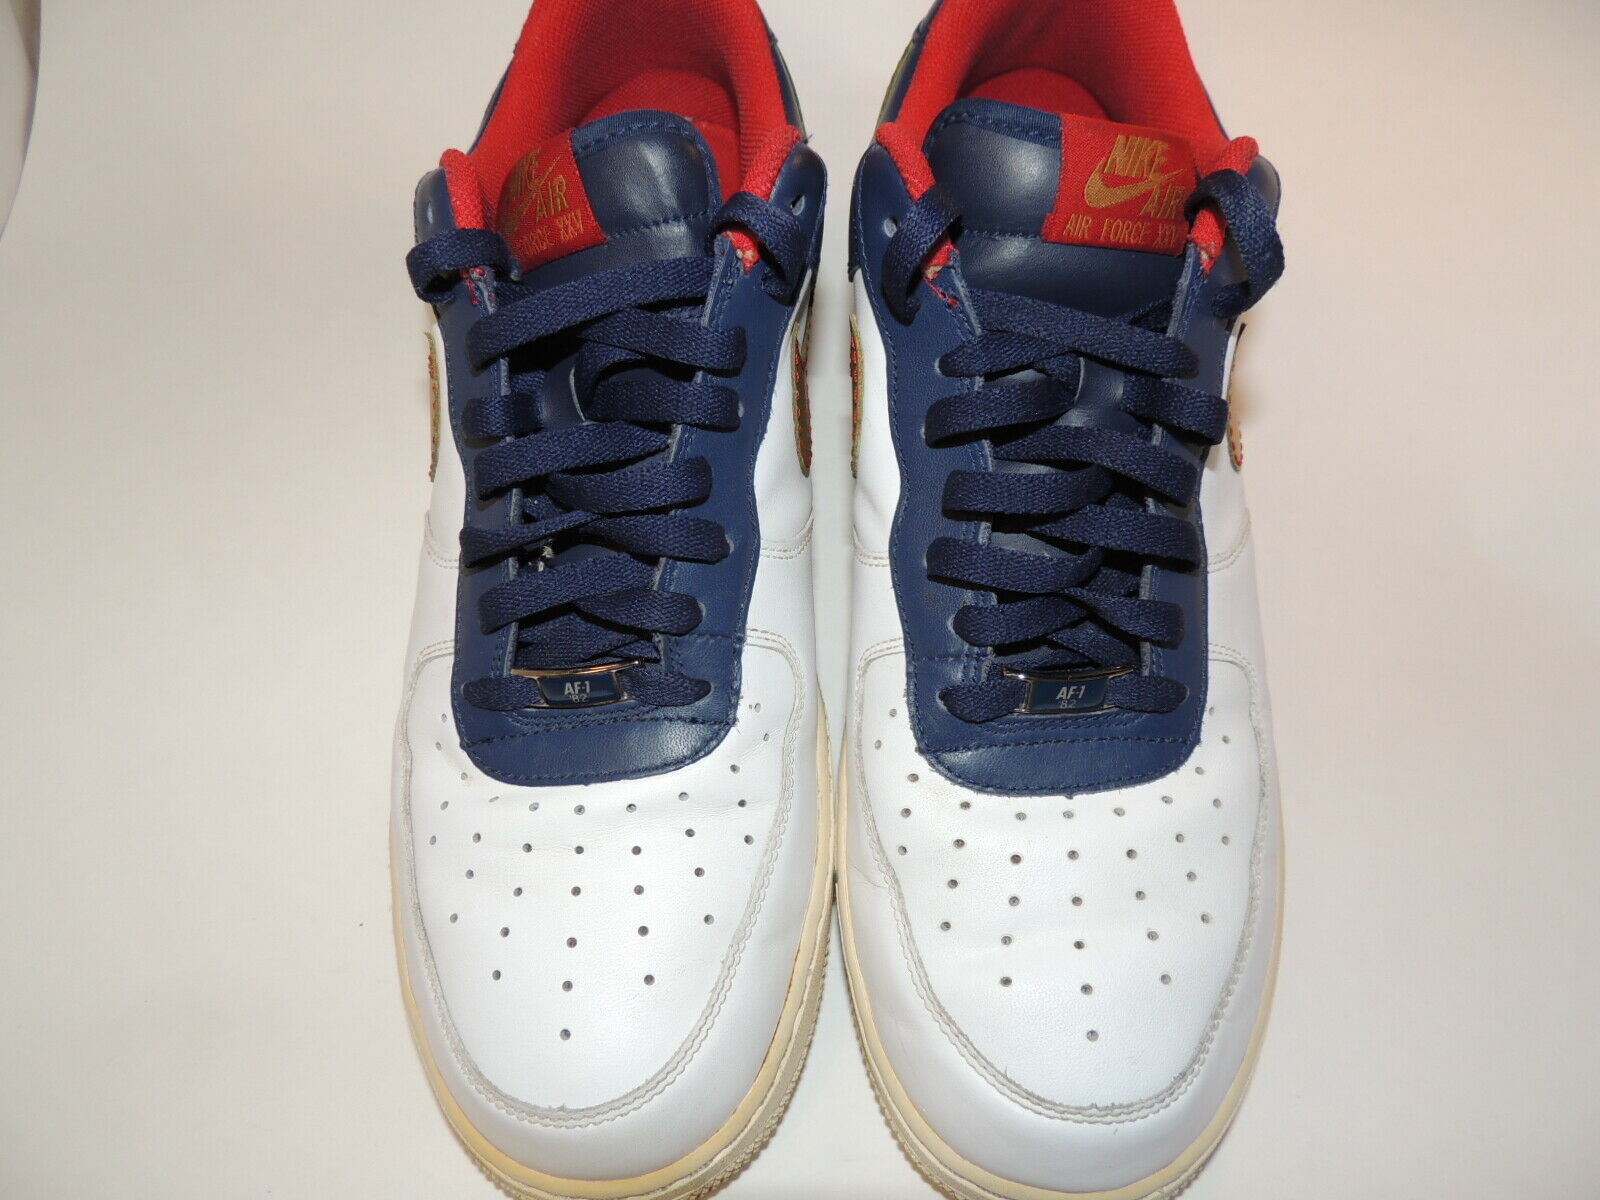 Men Nike Air Force XXXV AF-1 82 Size 13 White bluee &  gold